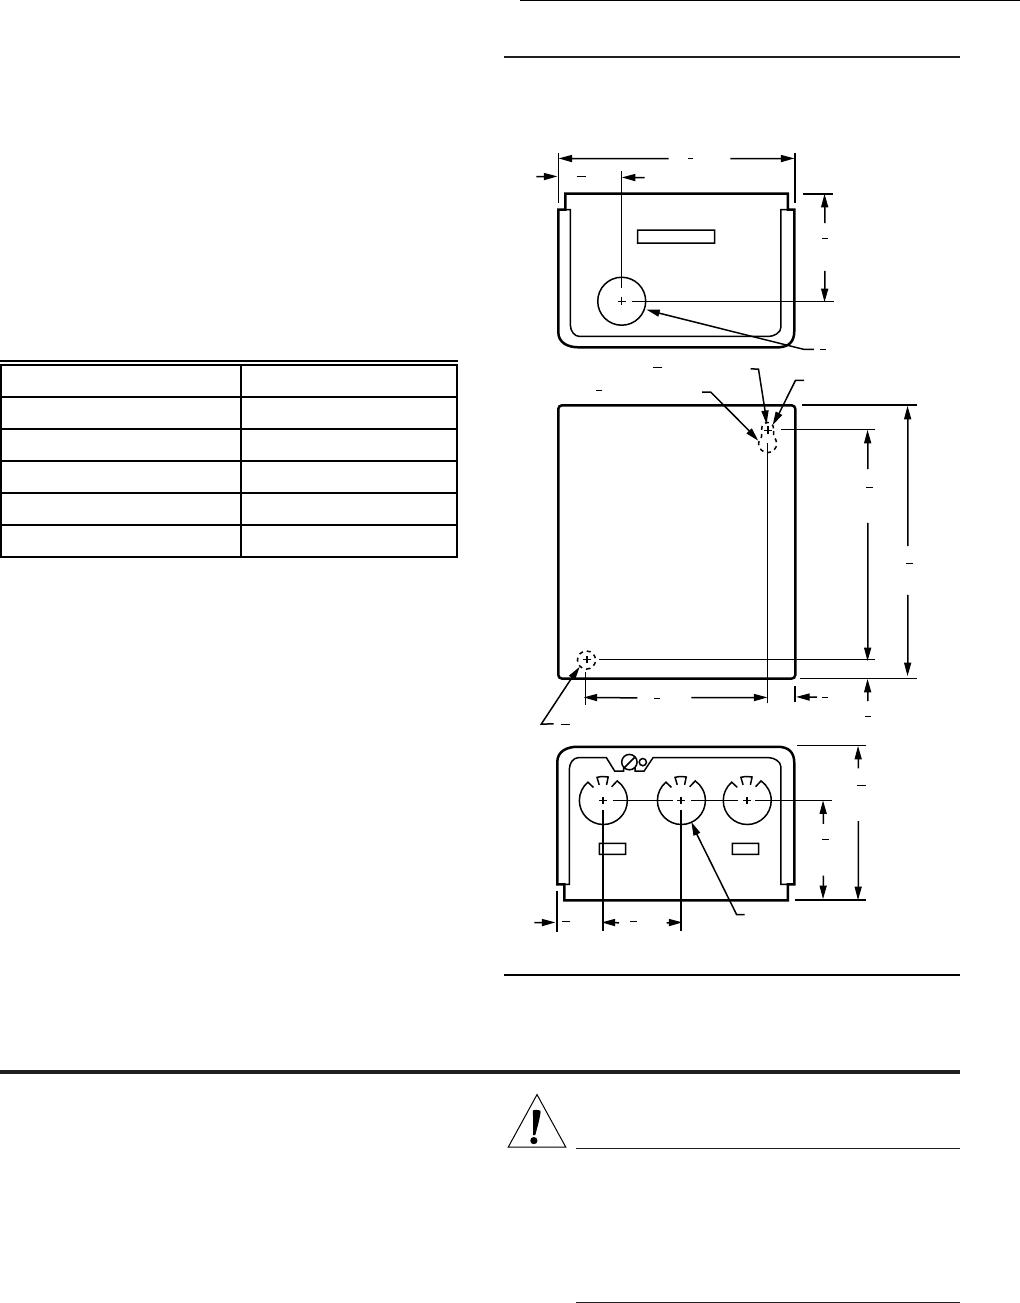 240v wiring diagram honeywell r847a honeywell switch r182j users manual 60 2481 r182j  r482j  r845a  honeywell switch r182j users manual 60